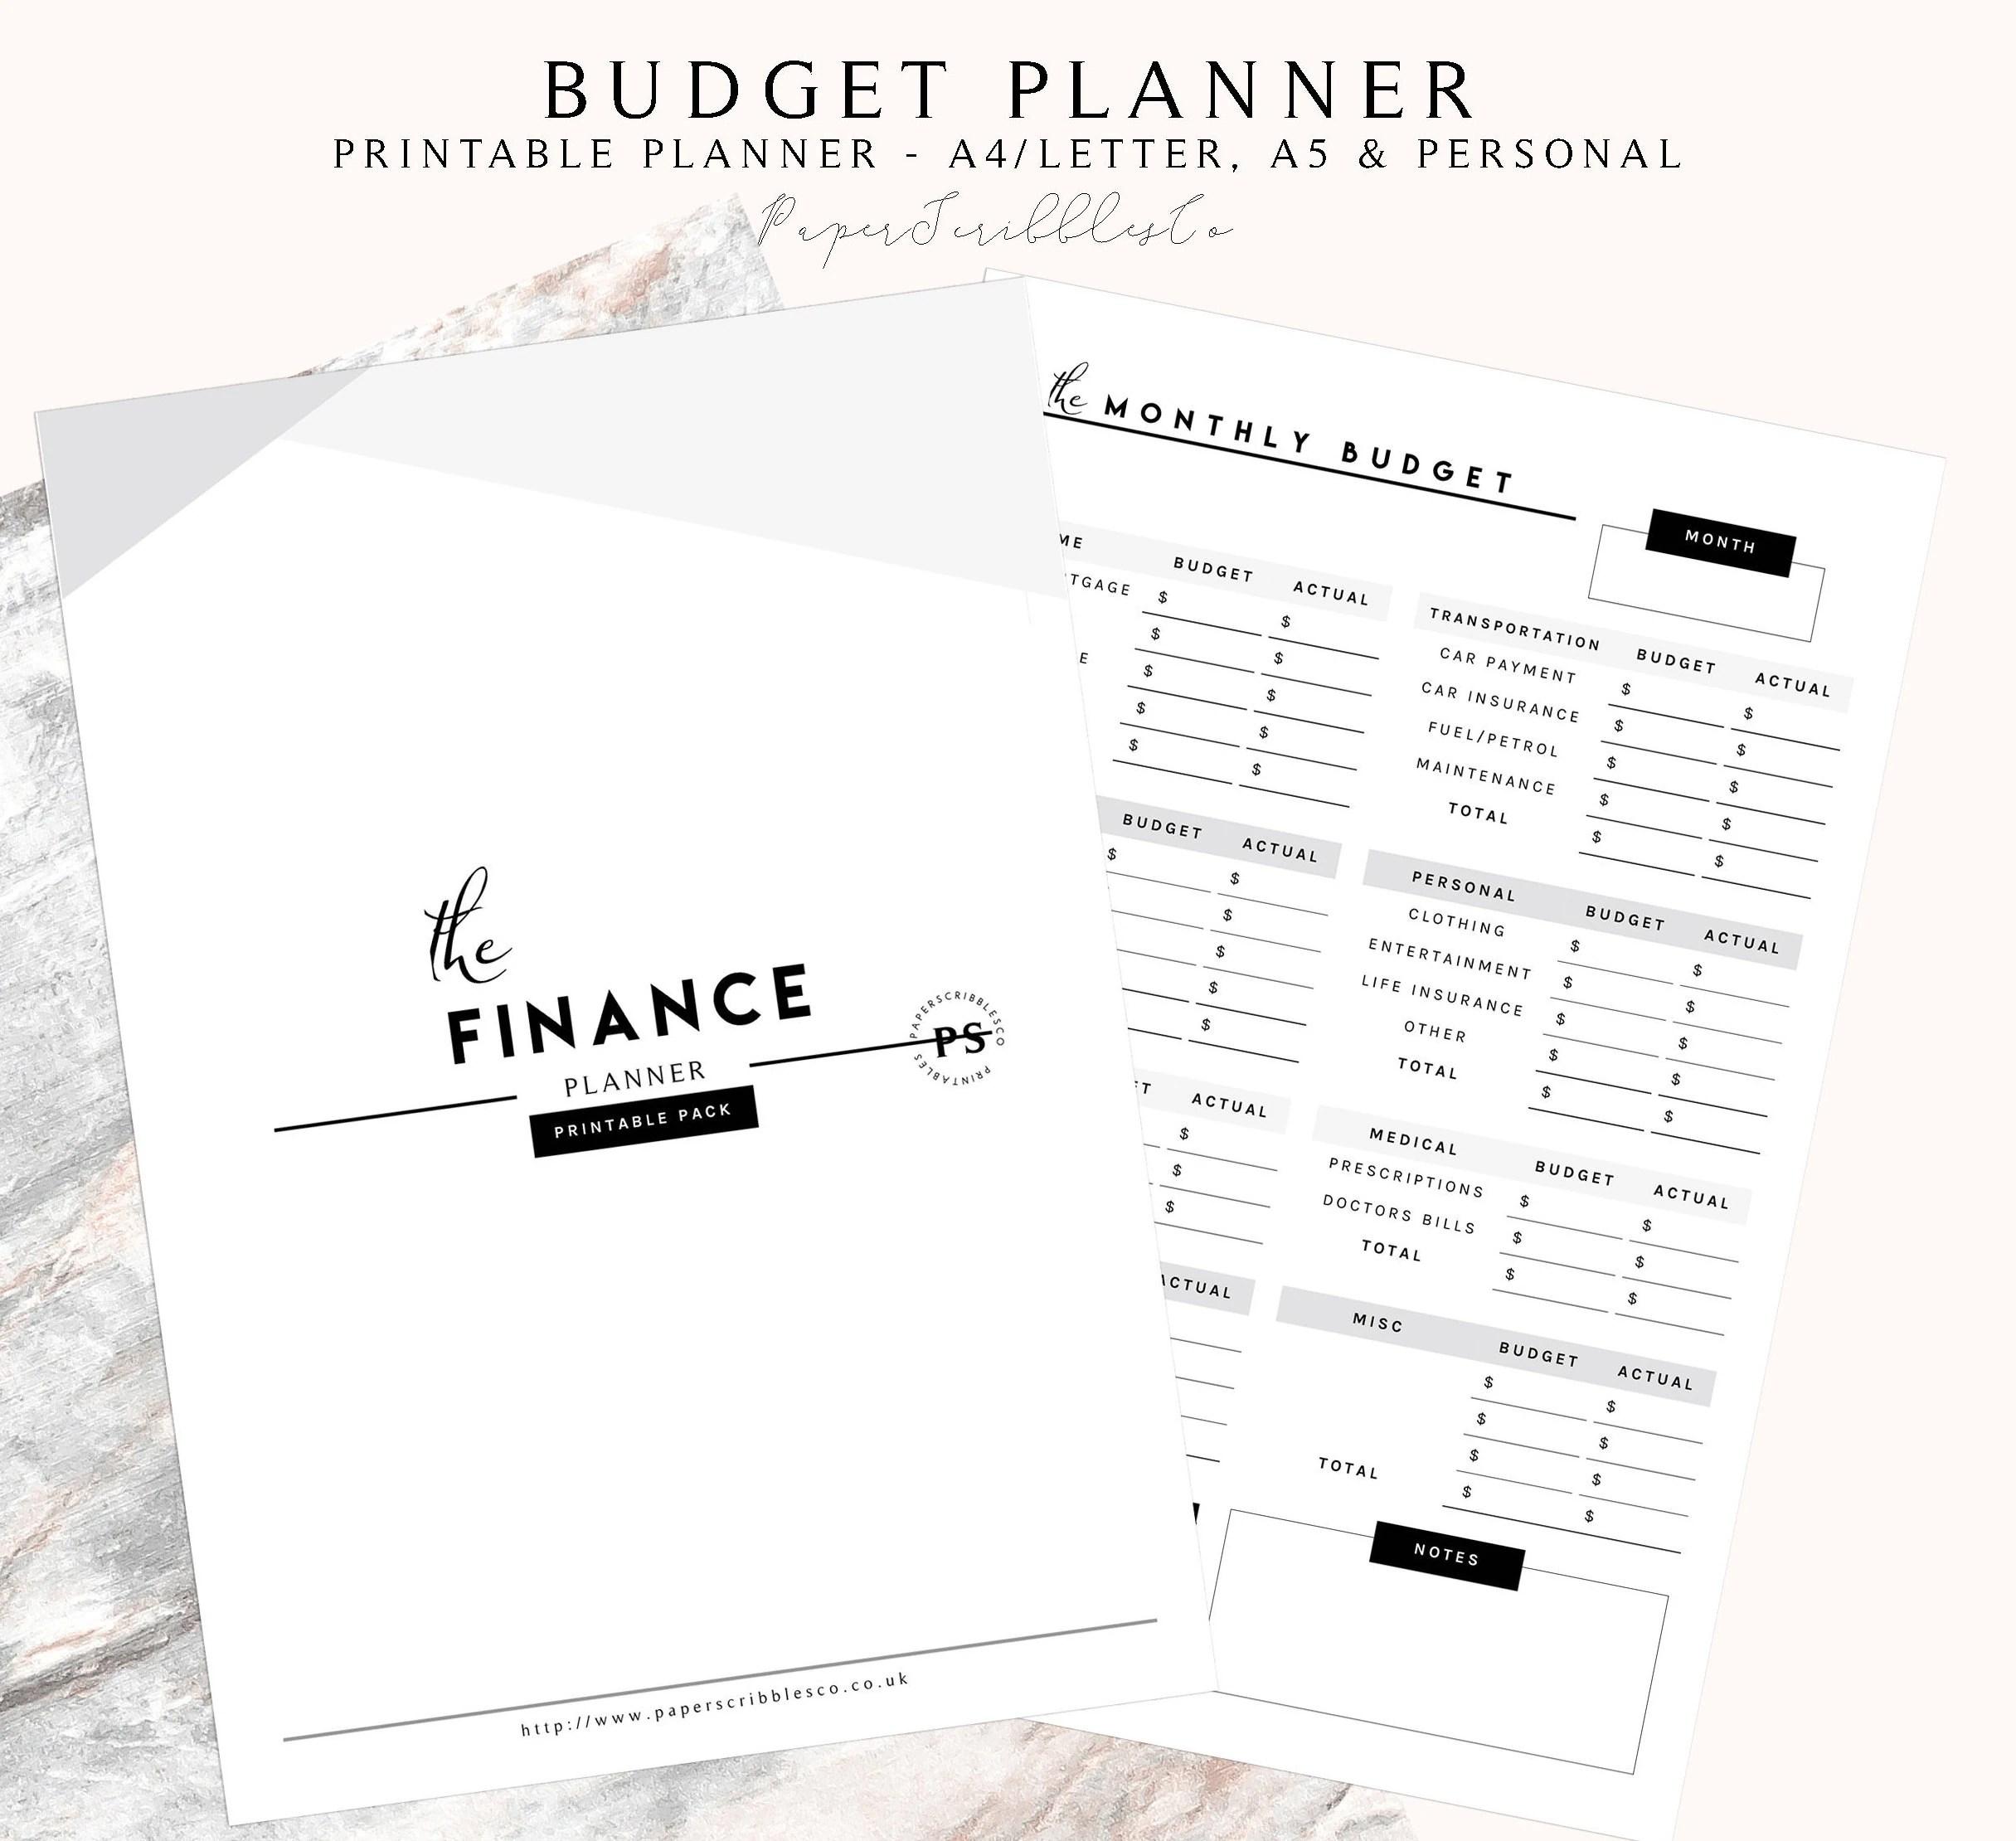 Printable Finance Planner Budget Planner Financial Planner